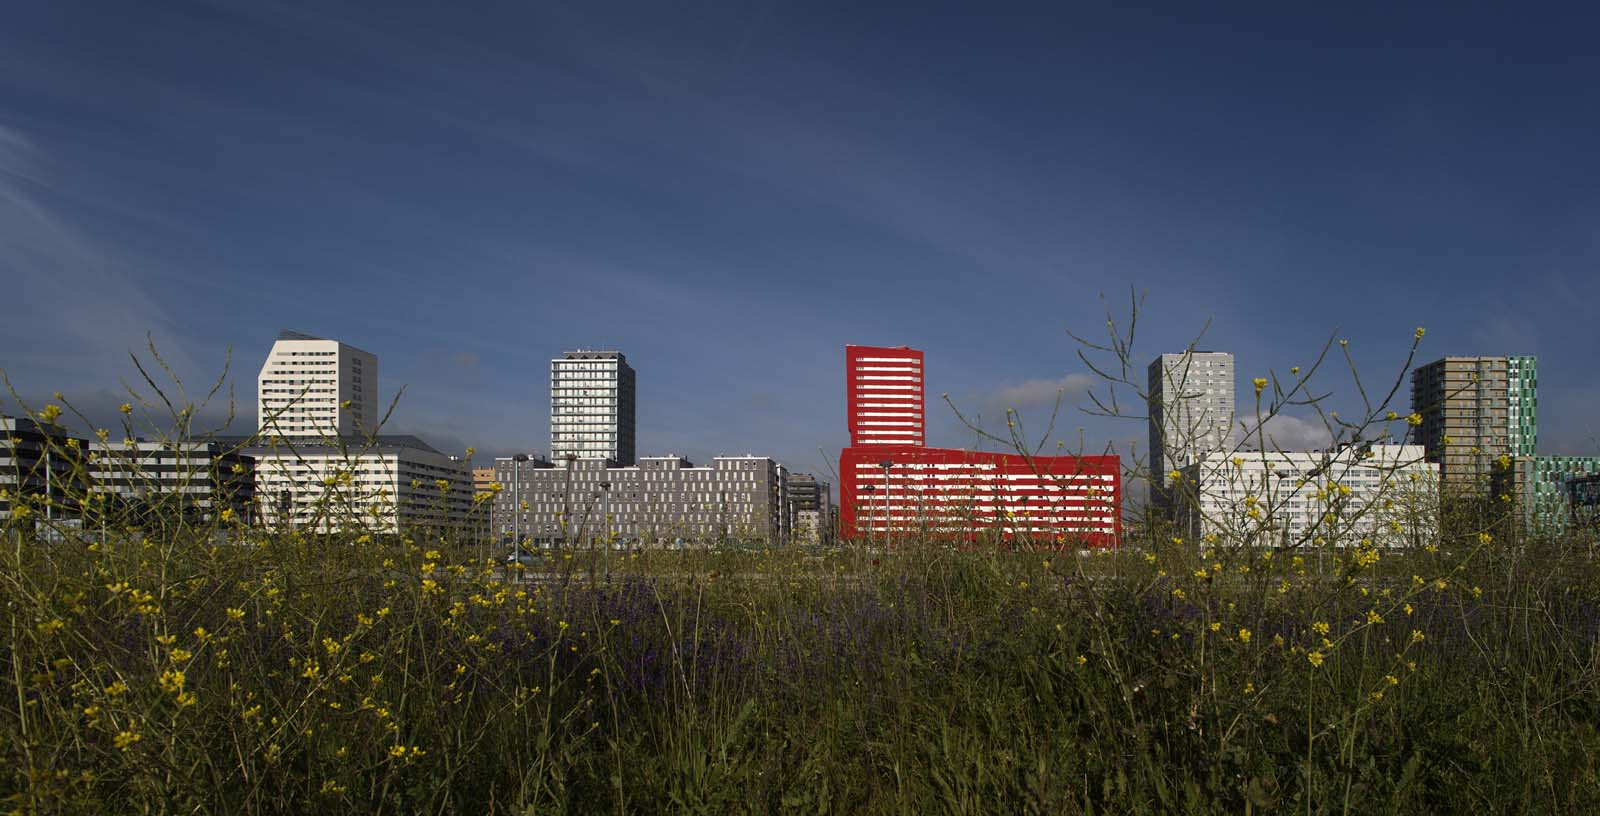 242_Salburua_Social_Housing_001_Architecture_IDOM_coyright_Aitor_Ortiz